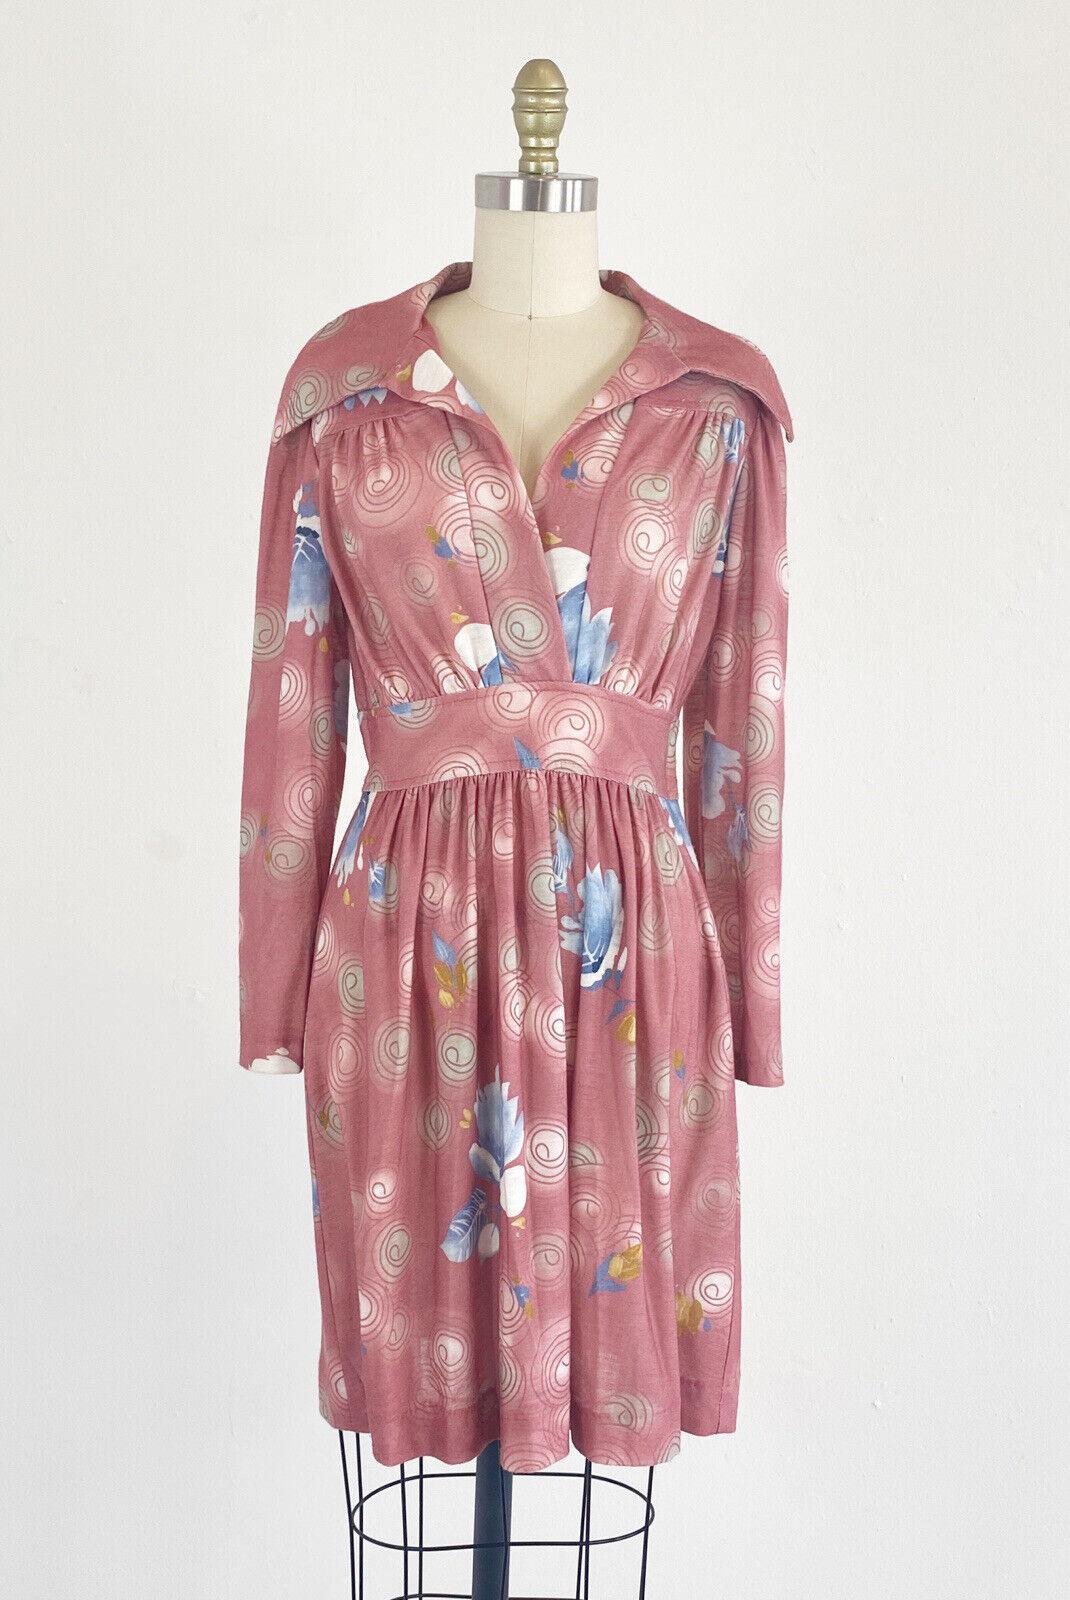 1970s Floral Dress - 1970s Mini Dress - Floral Mi… - image 2